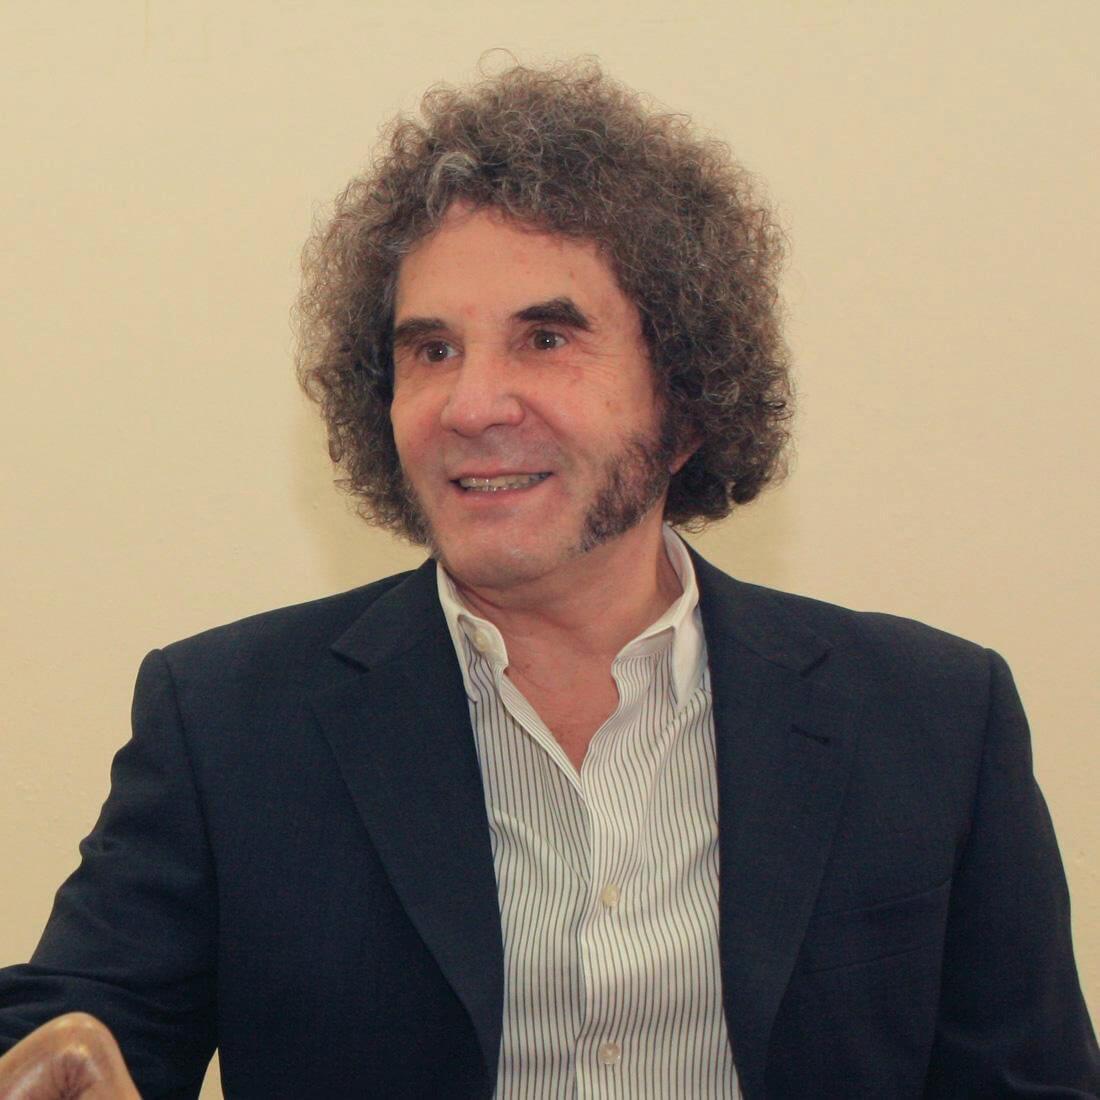 Jorge Pesqueira Leal